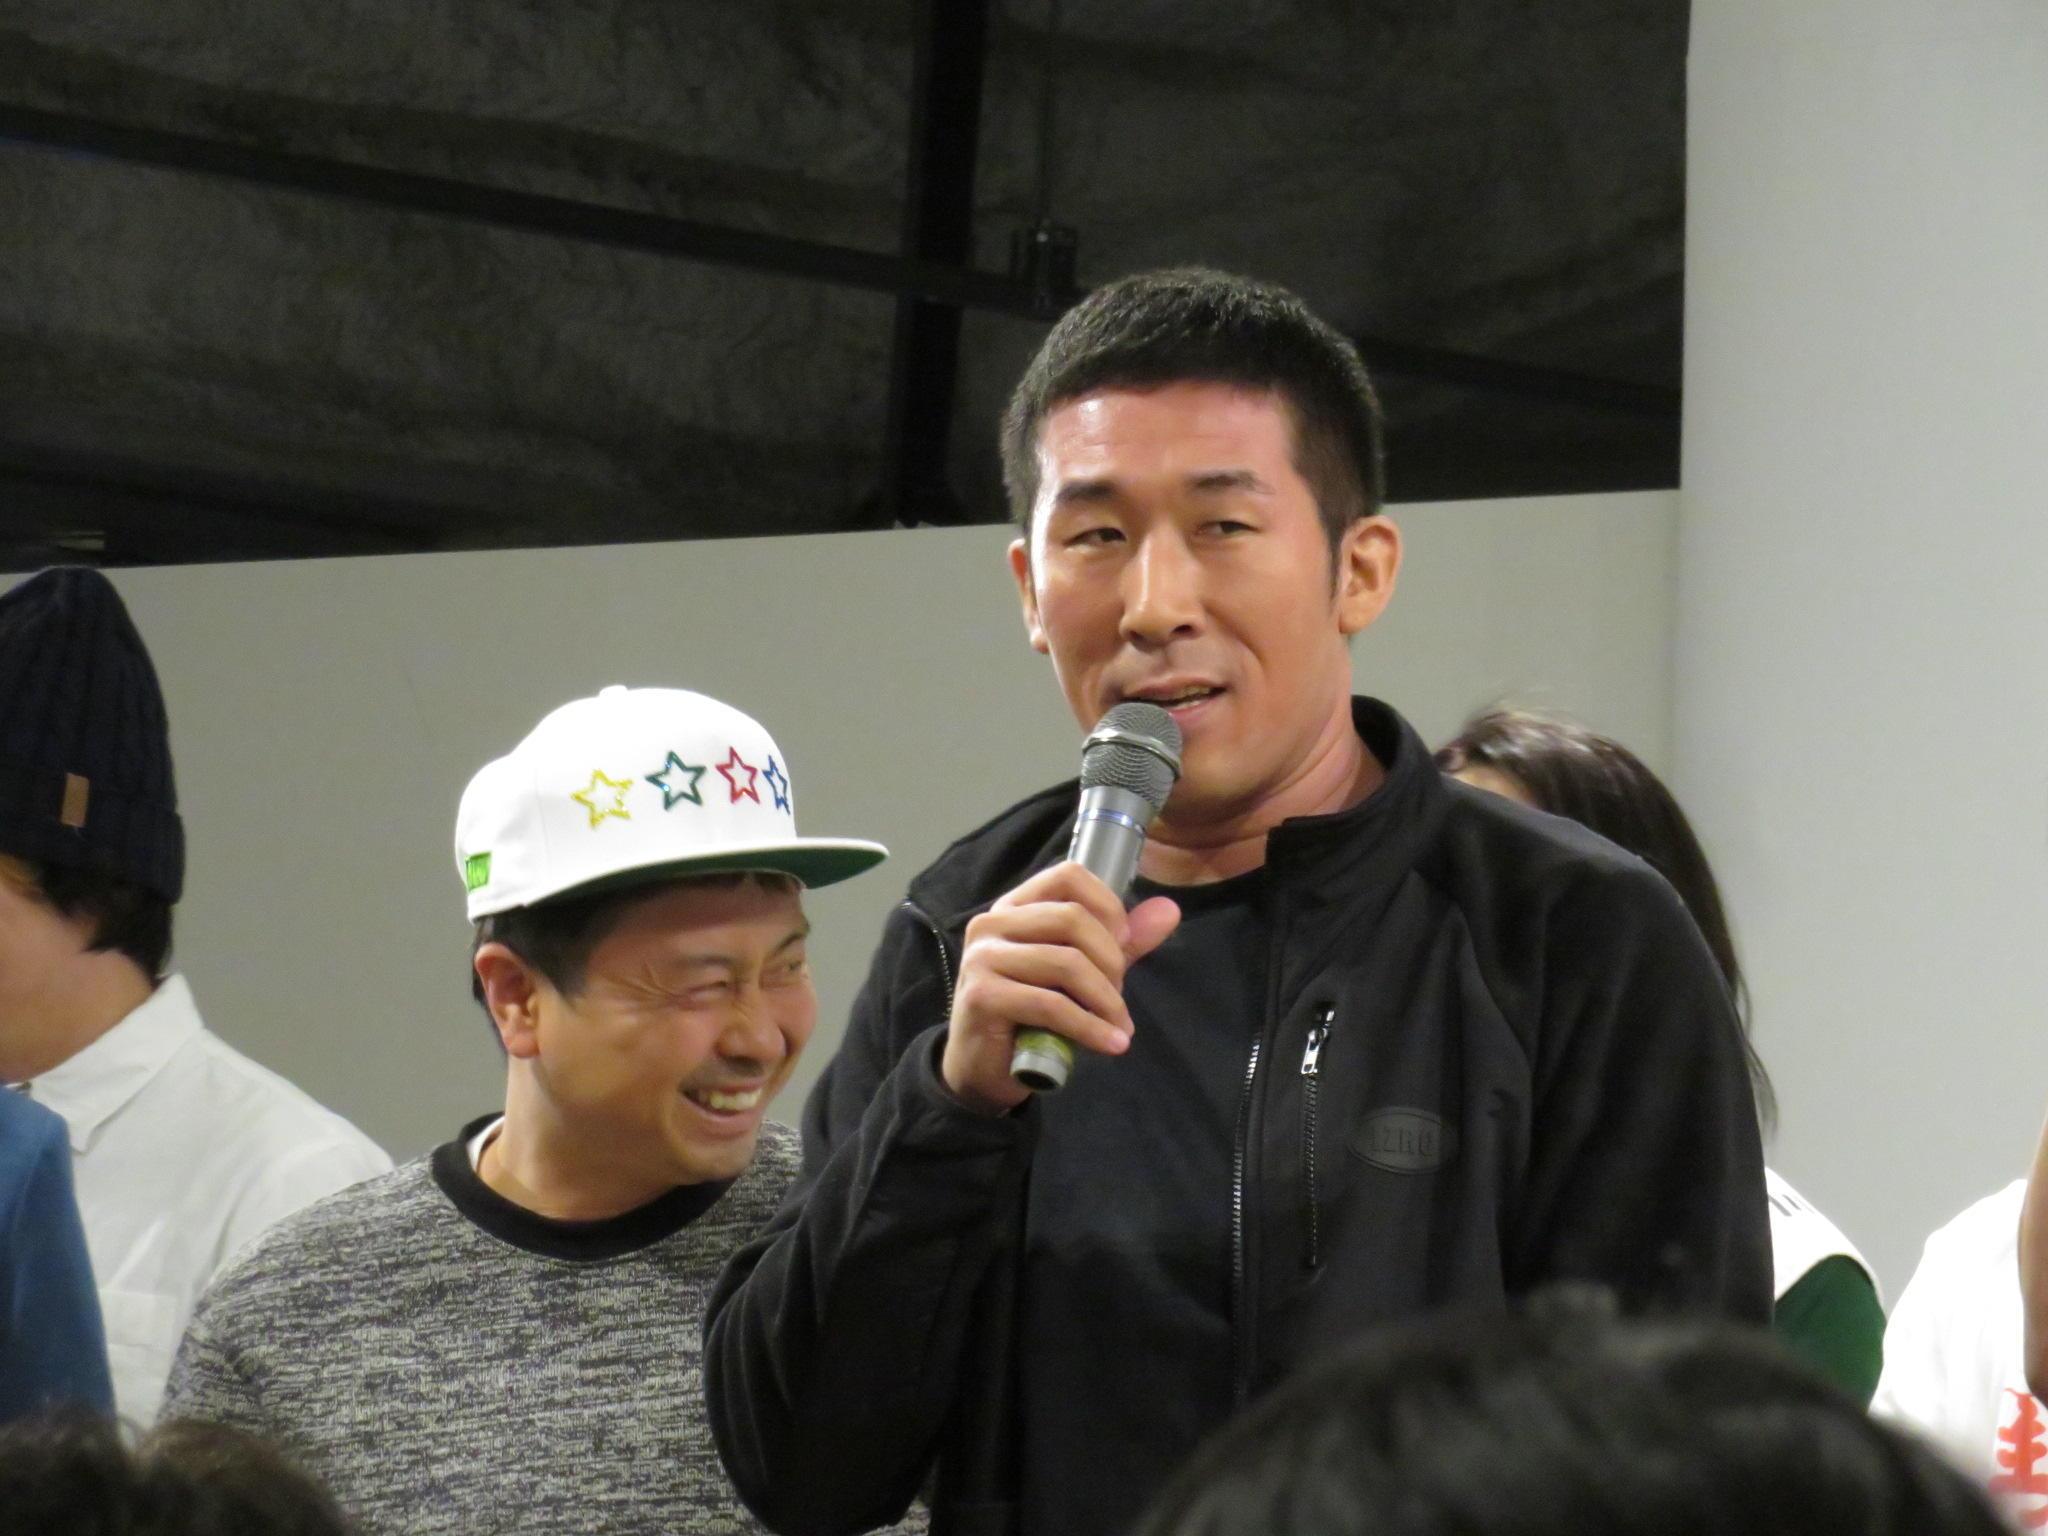 http://news.yoshimoto.co.jp/20181230001530-3cb47d0cca17311275f4a82ed41c4185ebf29e68.jpg